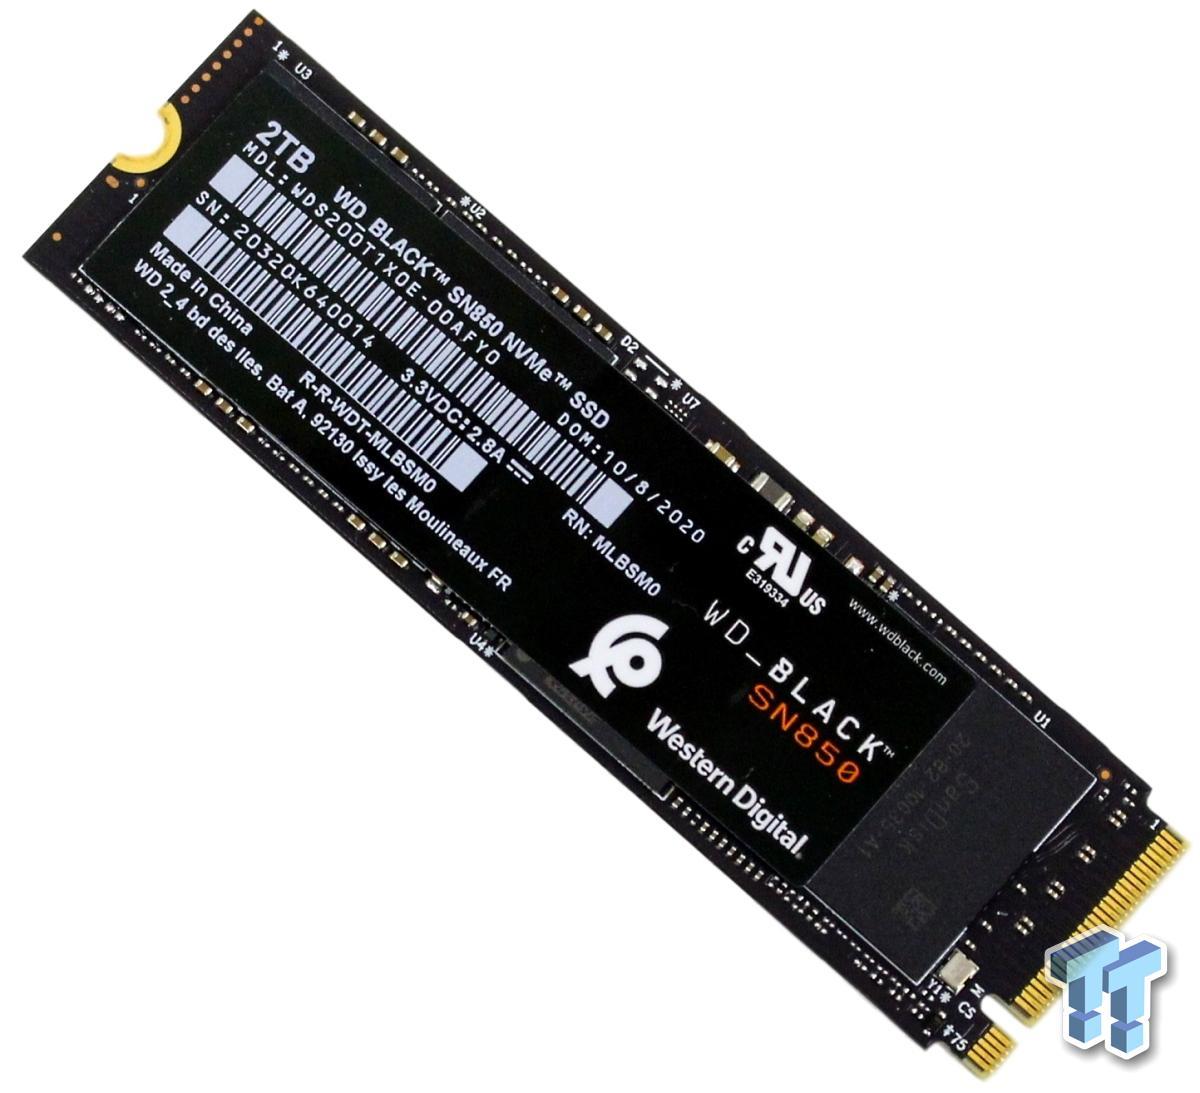 WD Black SN850 2TB NVMe M.2 SSD Review 45 | TweakTown.com